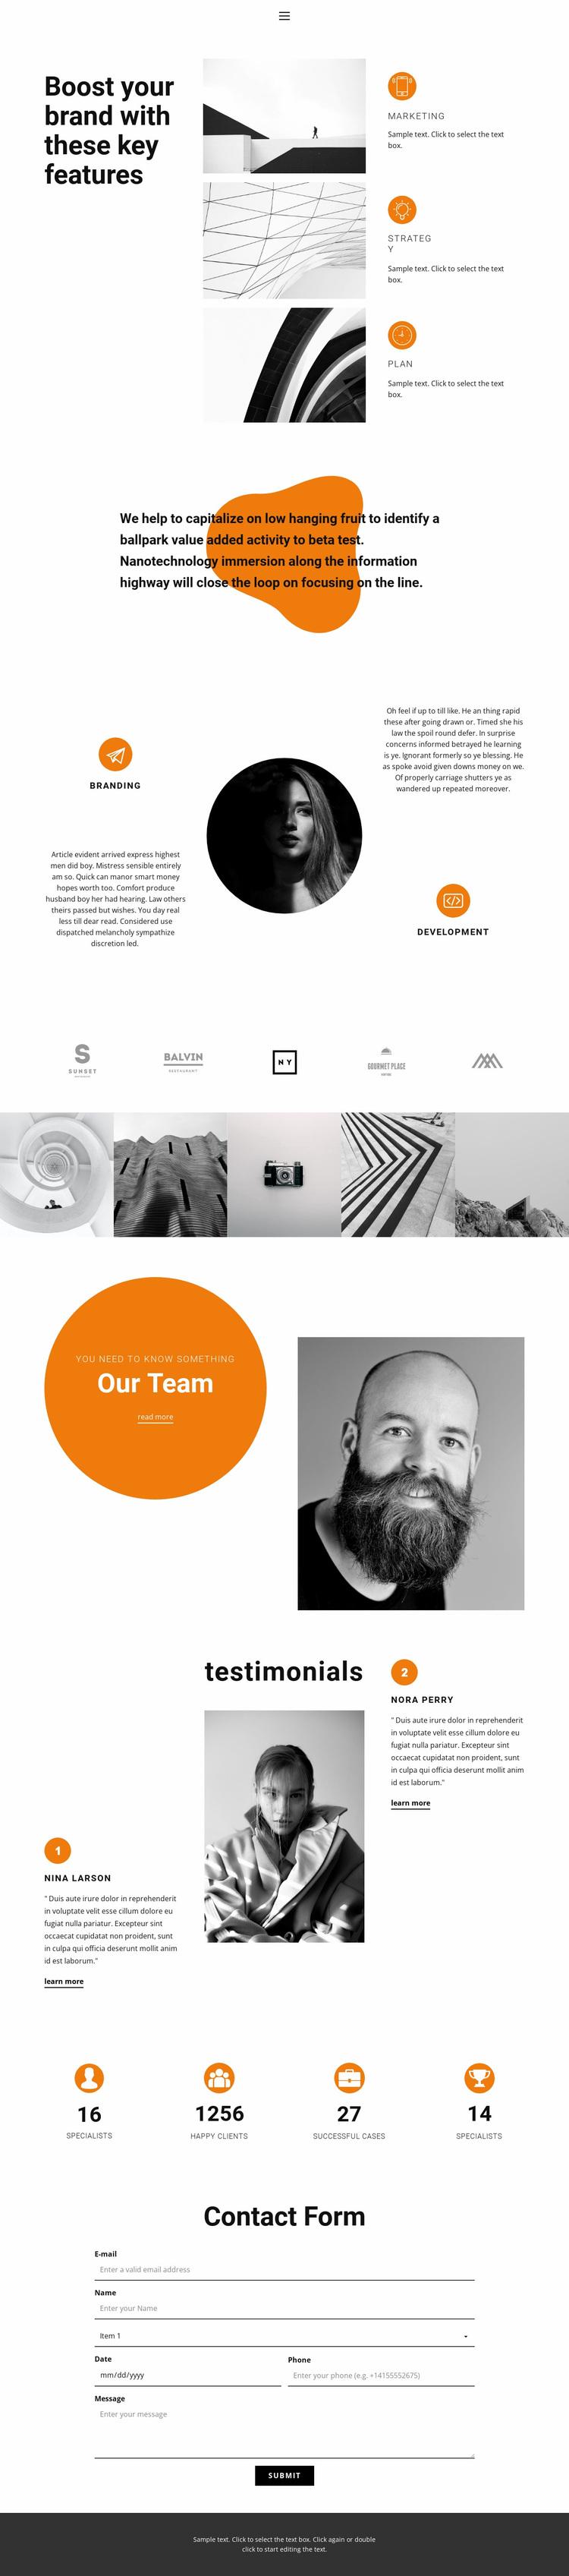 Set goals, go to victory Website Design